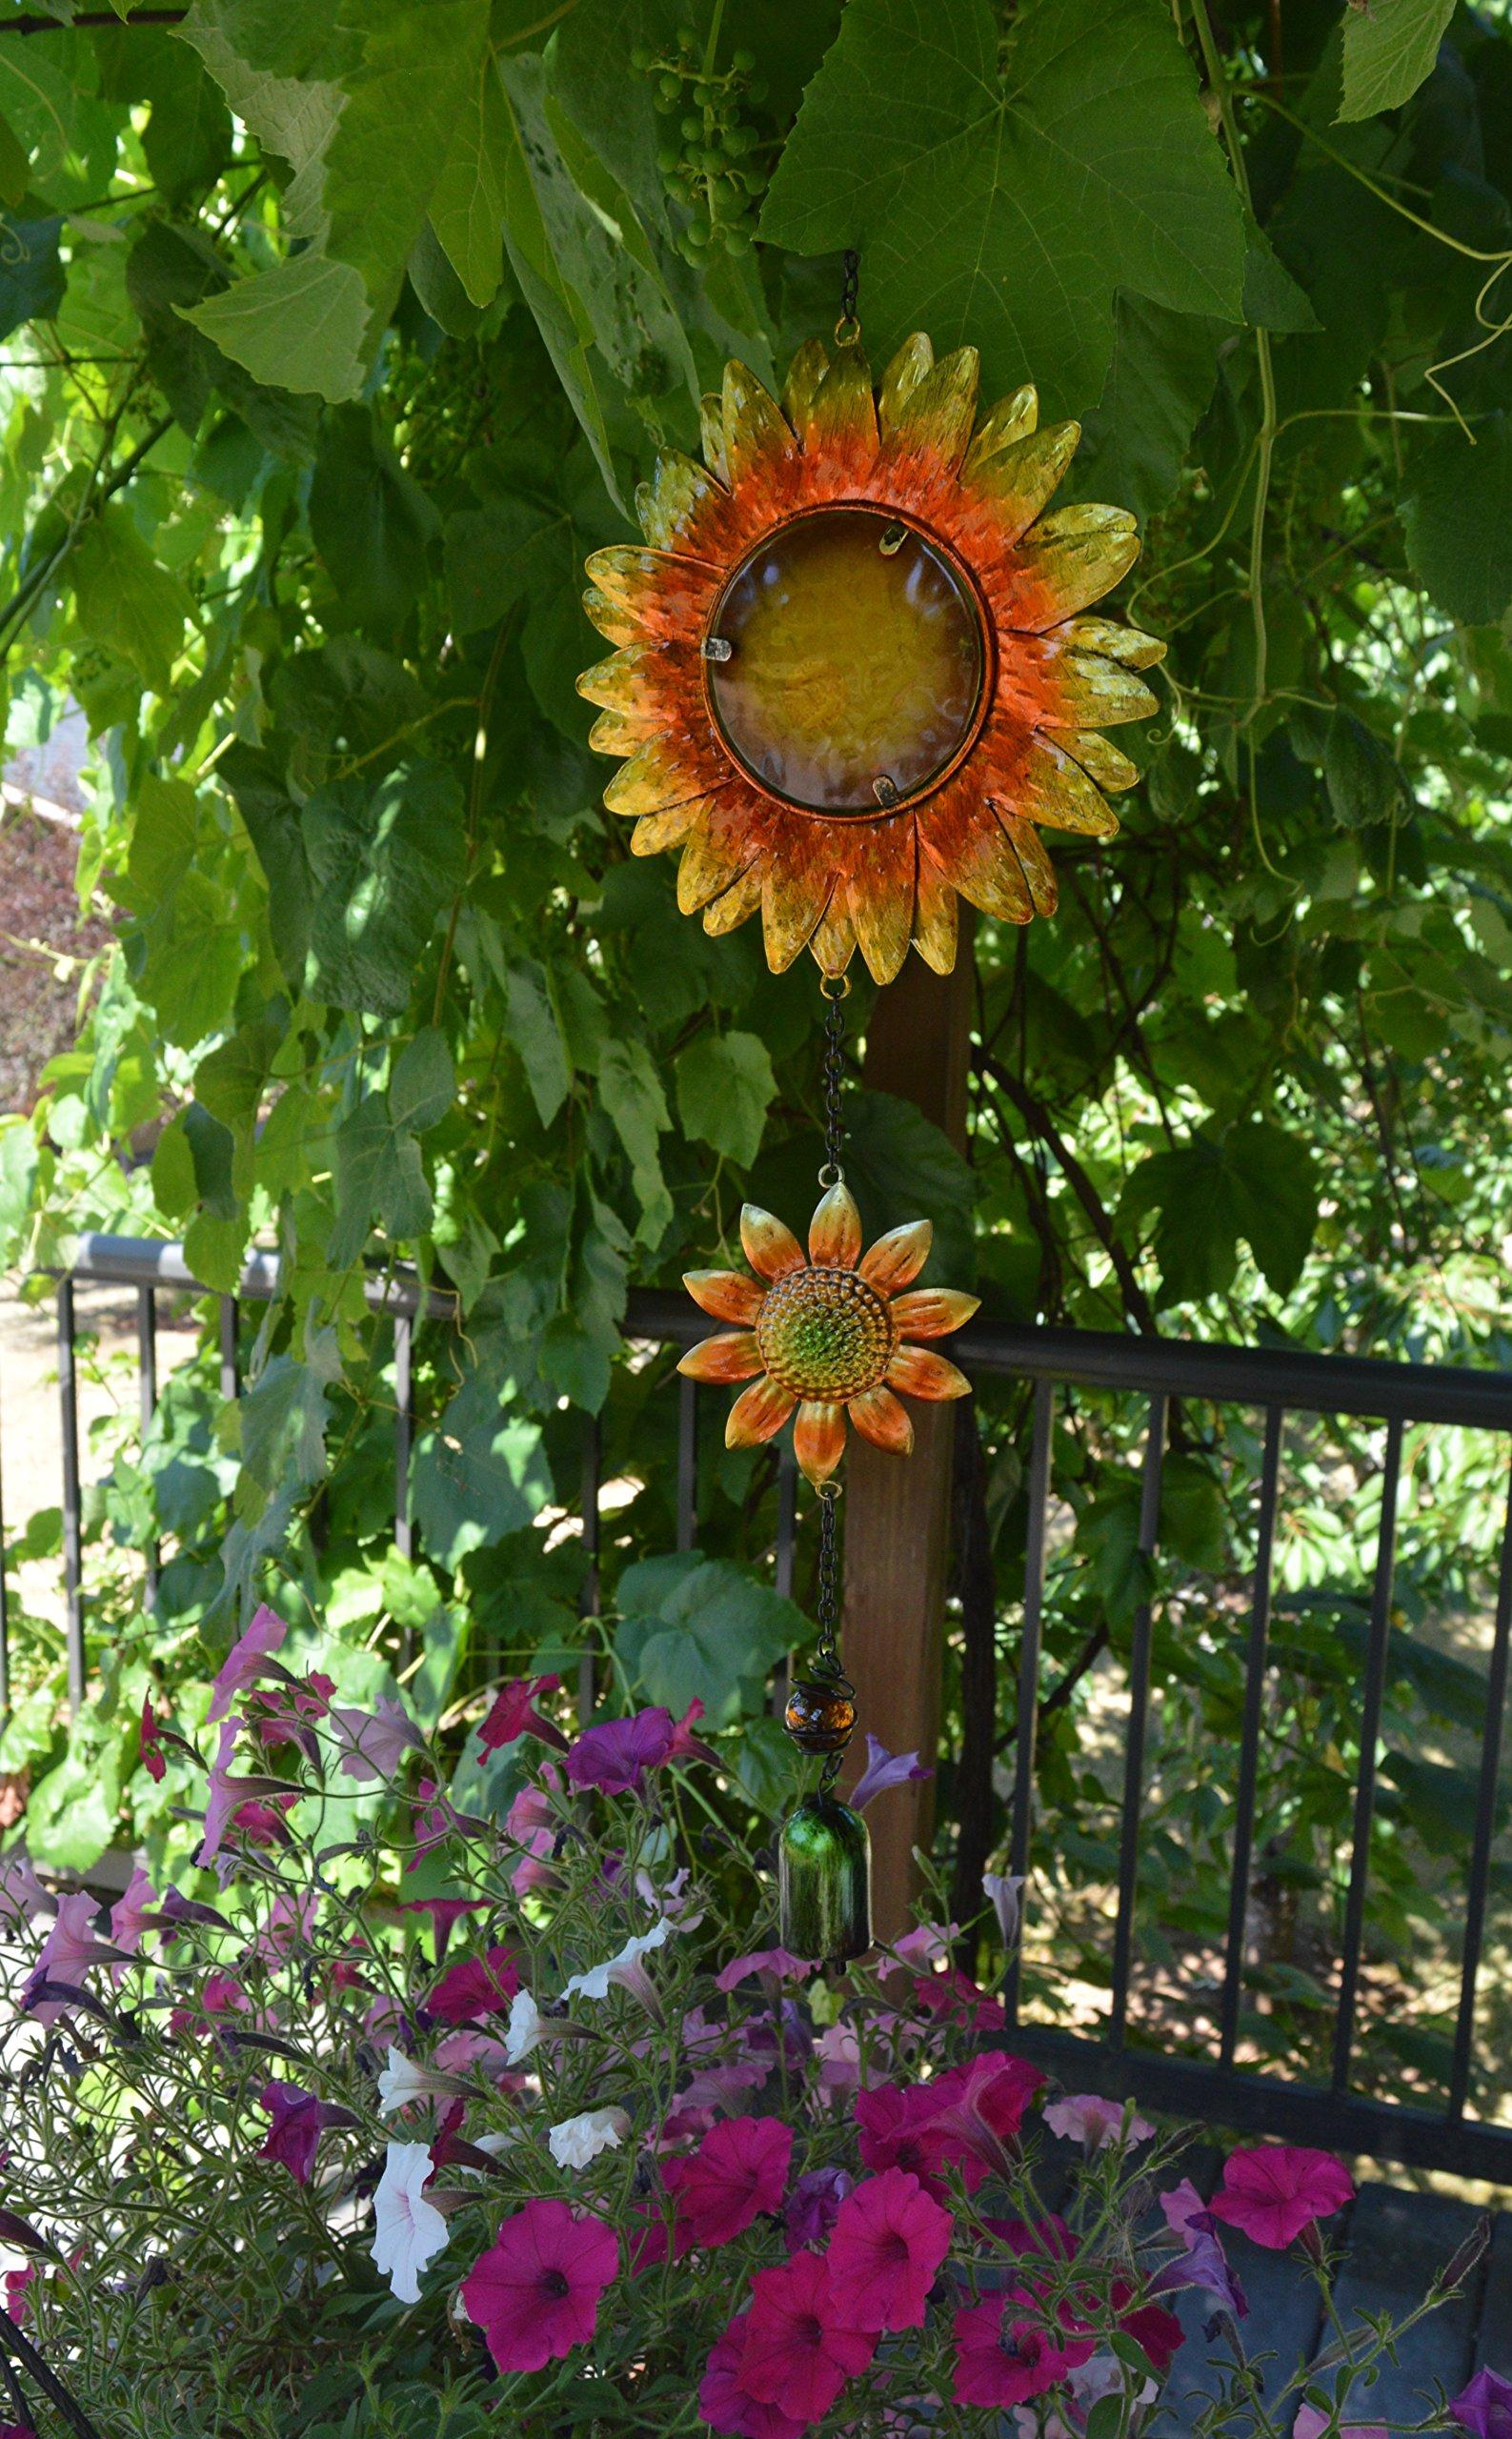 Sunset Vista Designs Hanging Decoration Garden Bell, 26-Inch, Sunflowers